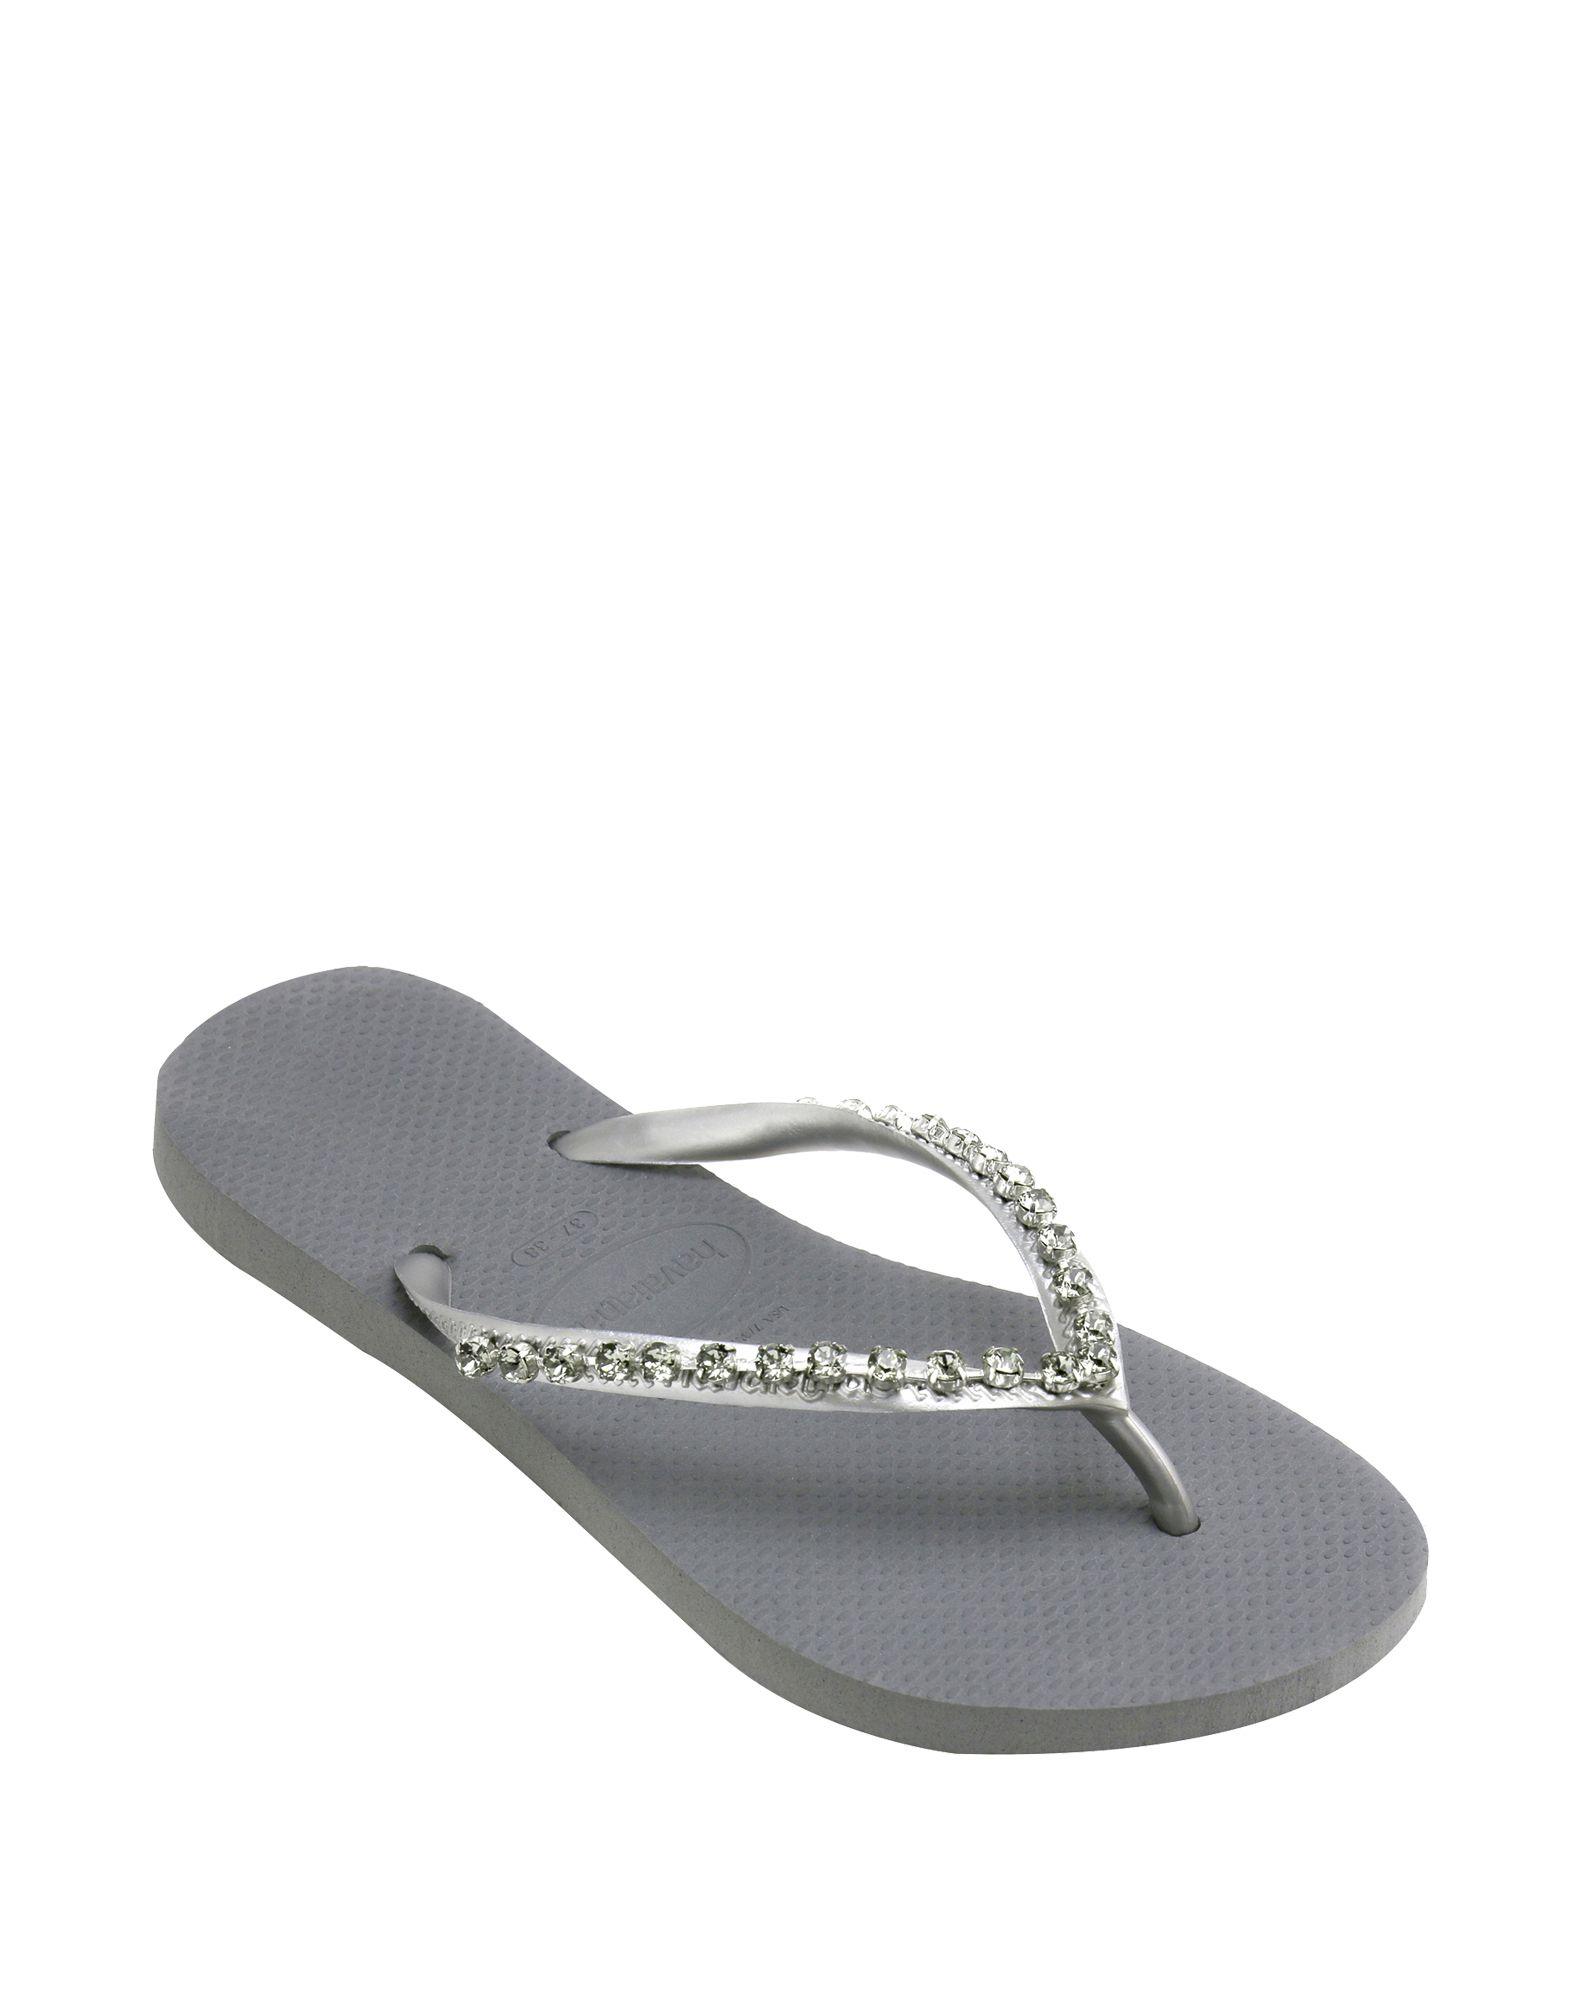 24ecd68b1 Slim Rock Mesh Mesh Mesh - Flip Flops - Women Havaianas Flip Flops